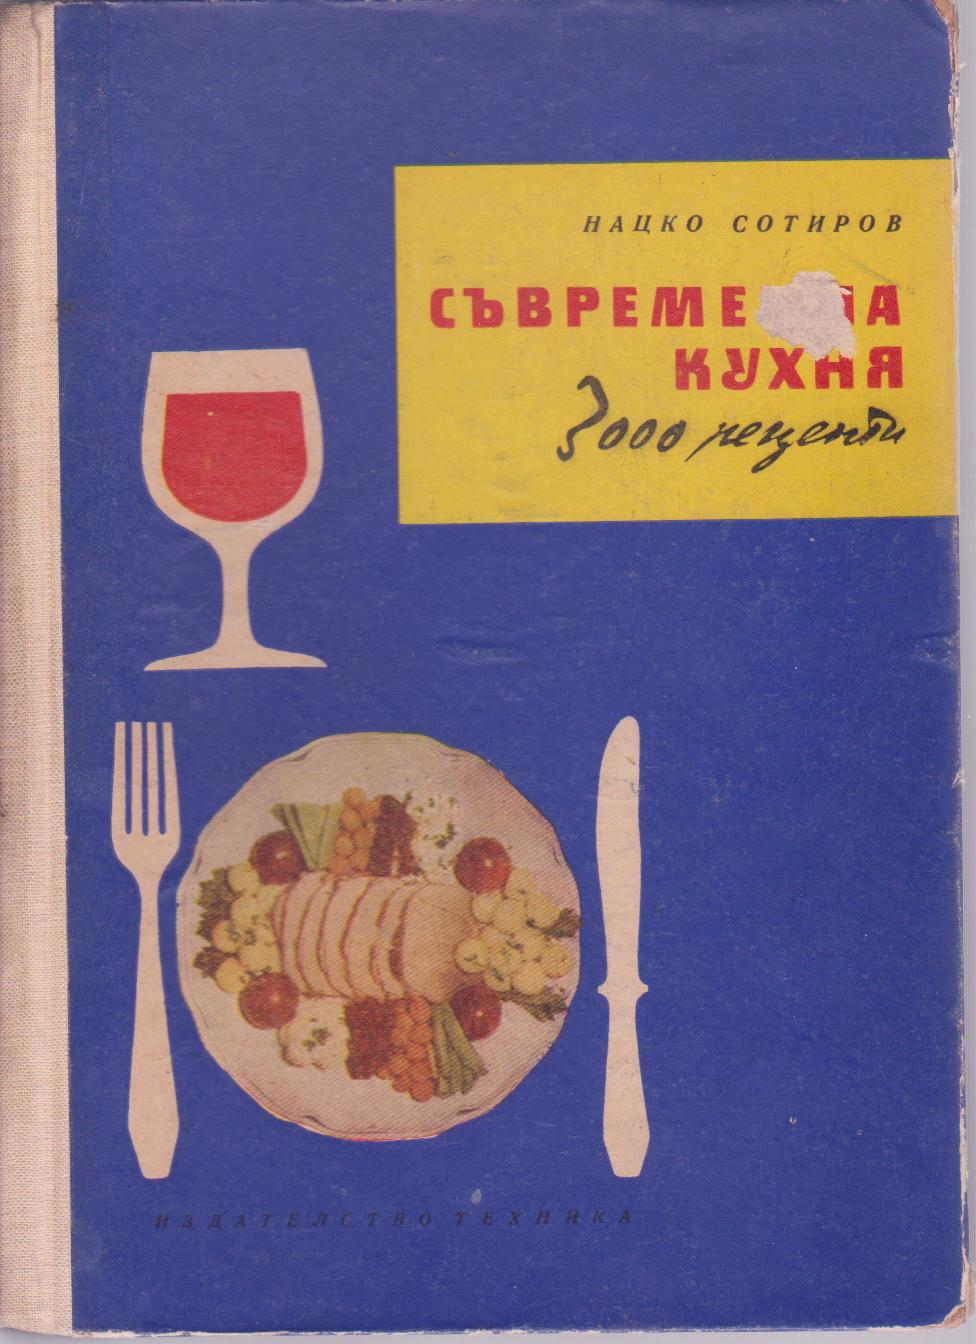 1959-Savremenna-kuhnia-3000-recepti